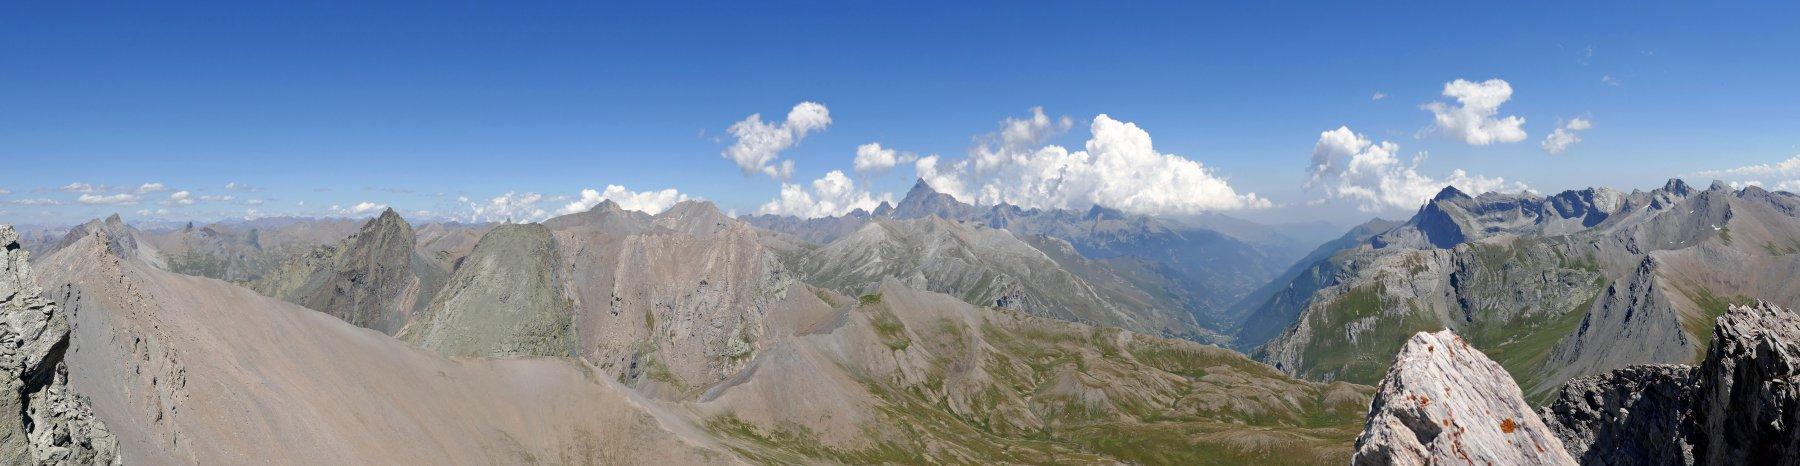 Panoramica verso Pelvo di Ciabrera, Mongioia, Salza, Viso, Pelvo e Marchisa